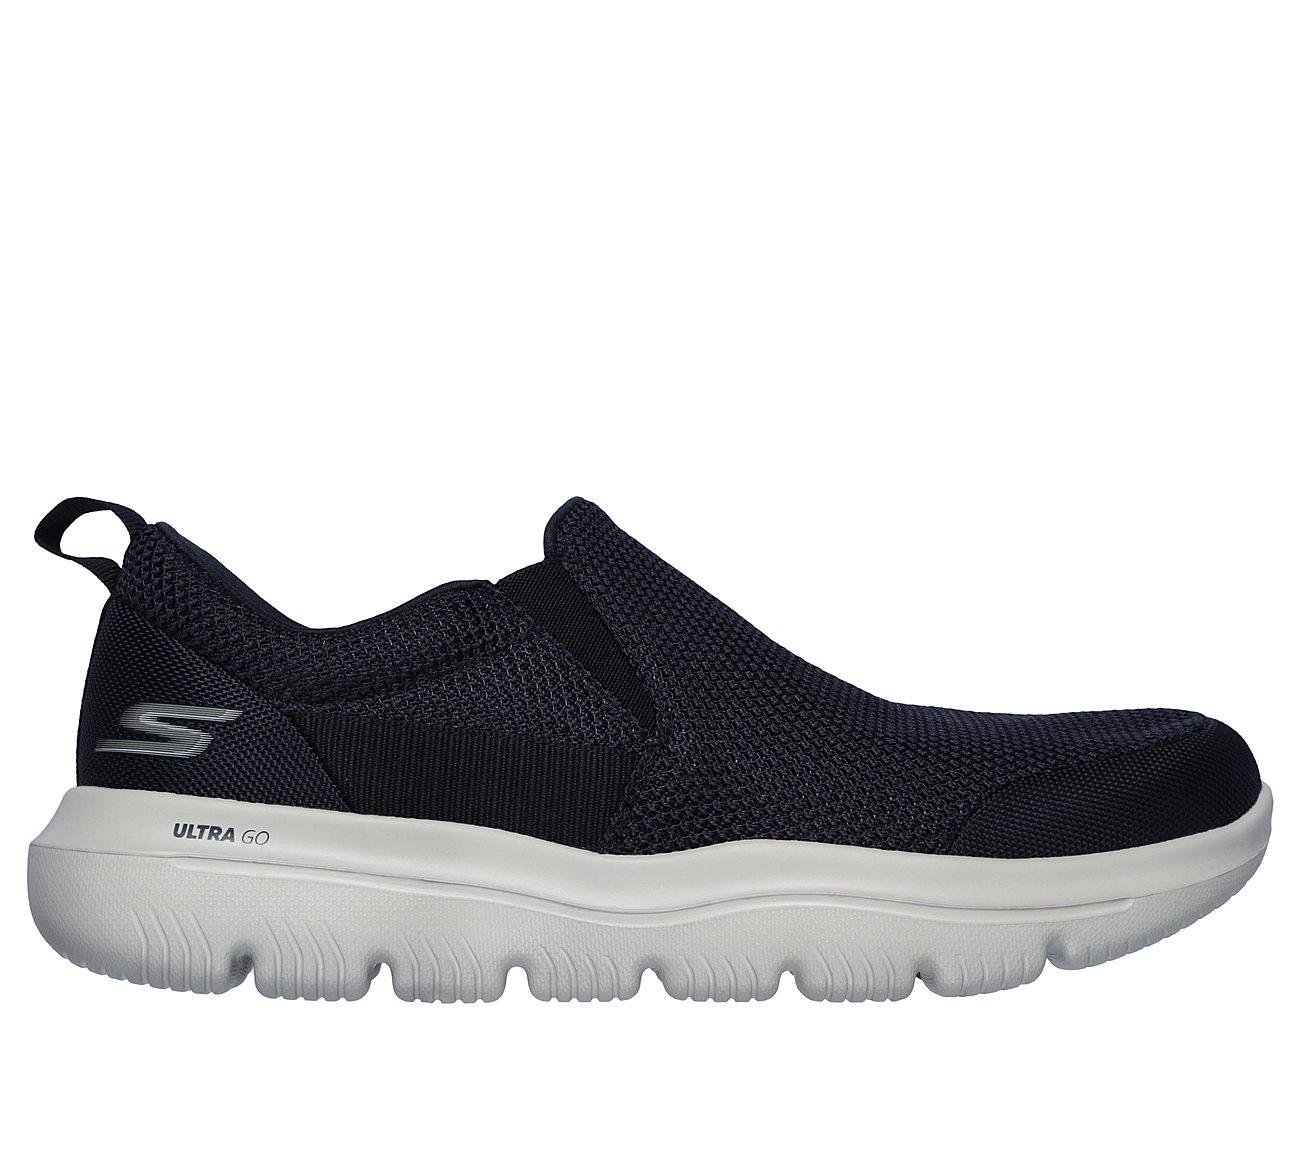 Skechers GOwalk Evolution Ultra - Impeccable